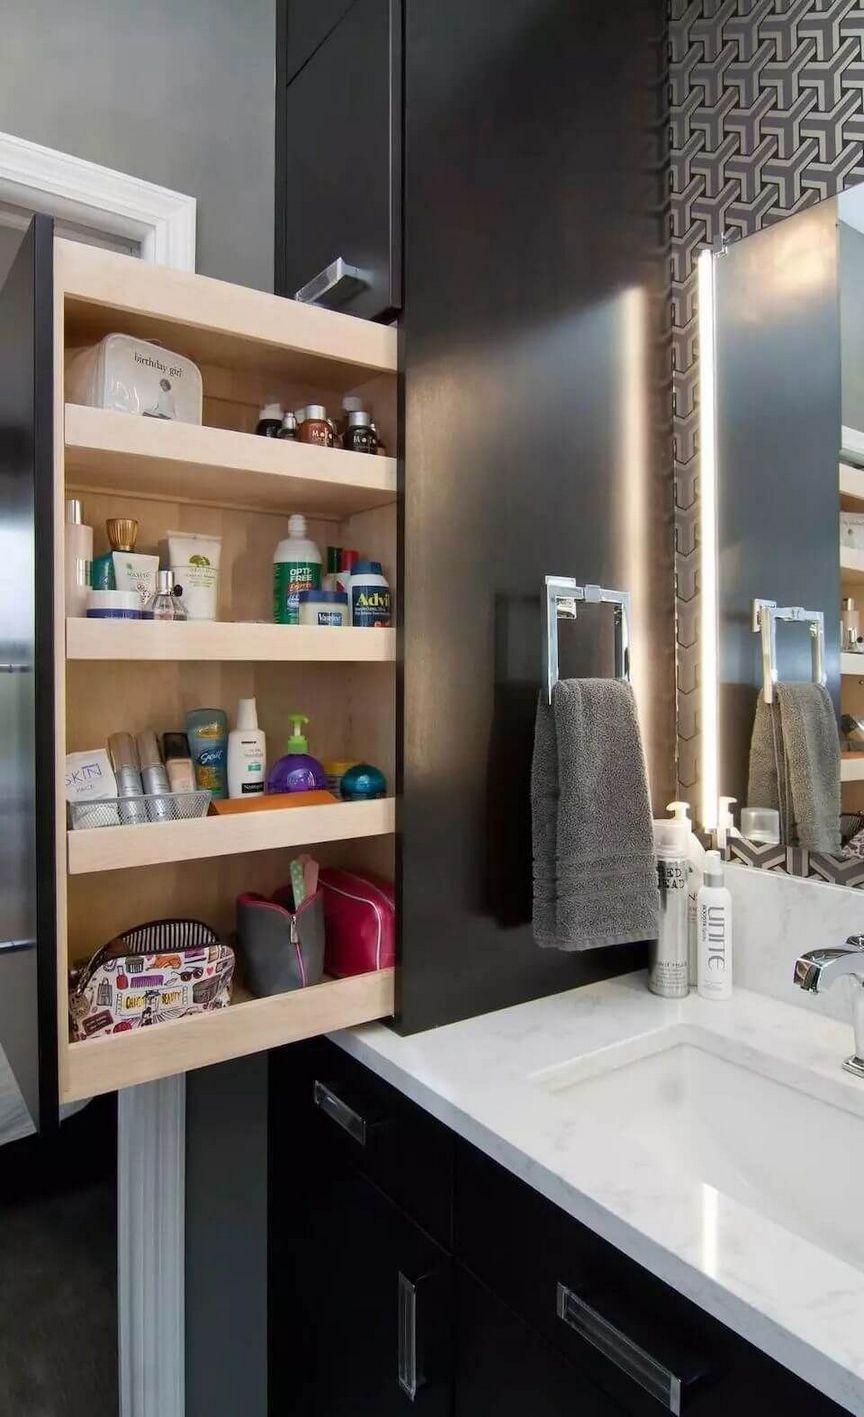 40 Creative Diy Bathroom Storage Ideas For You Diy Bathroom Storage Bathroom Storage Cabinet Bathroom Design